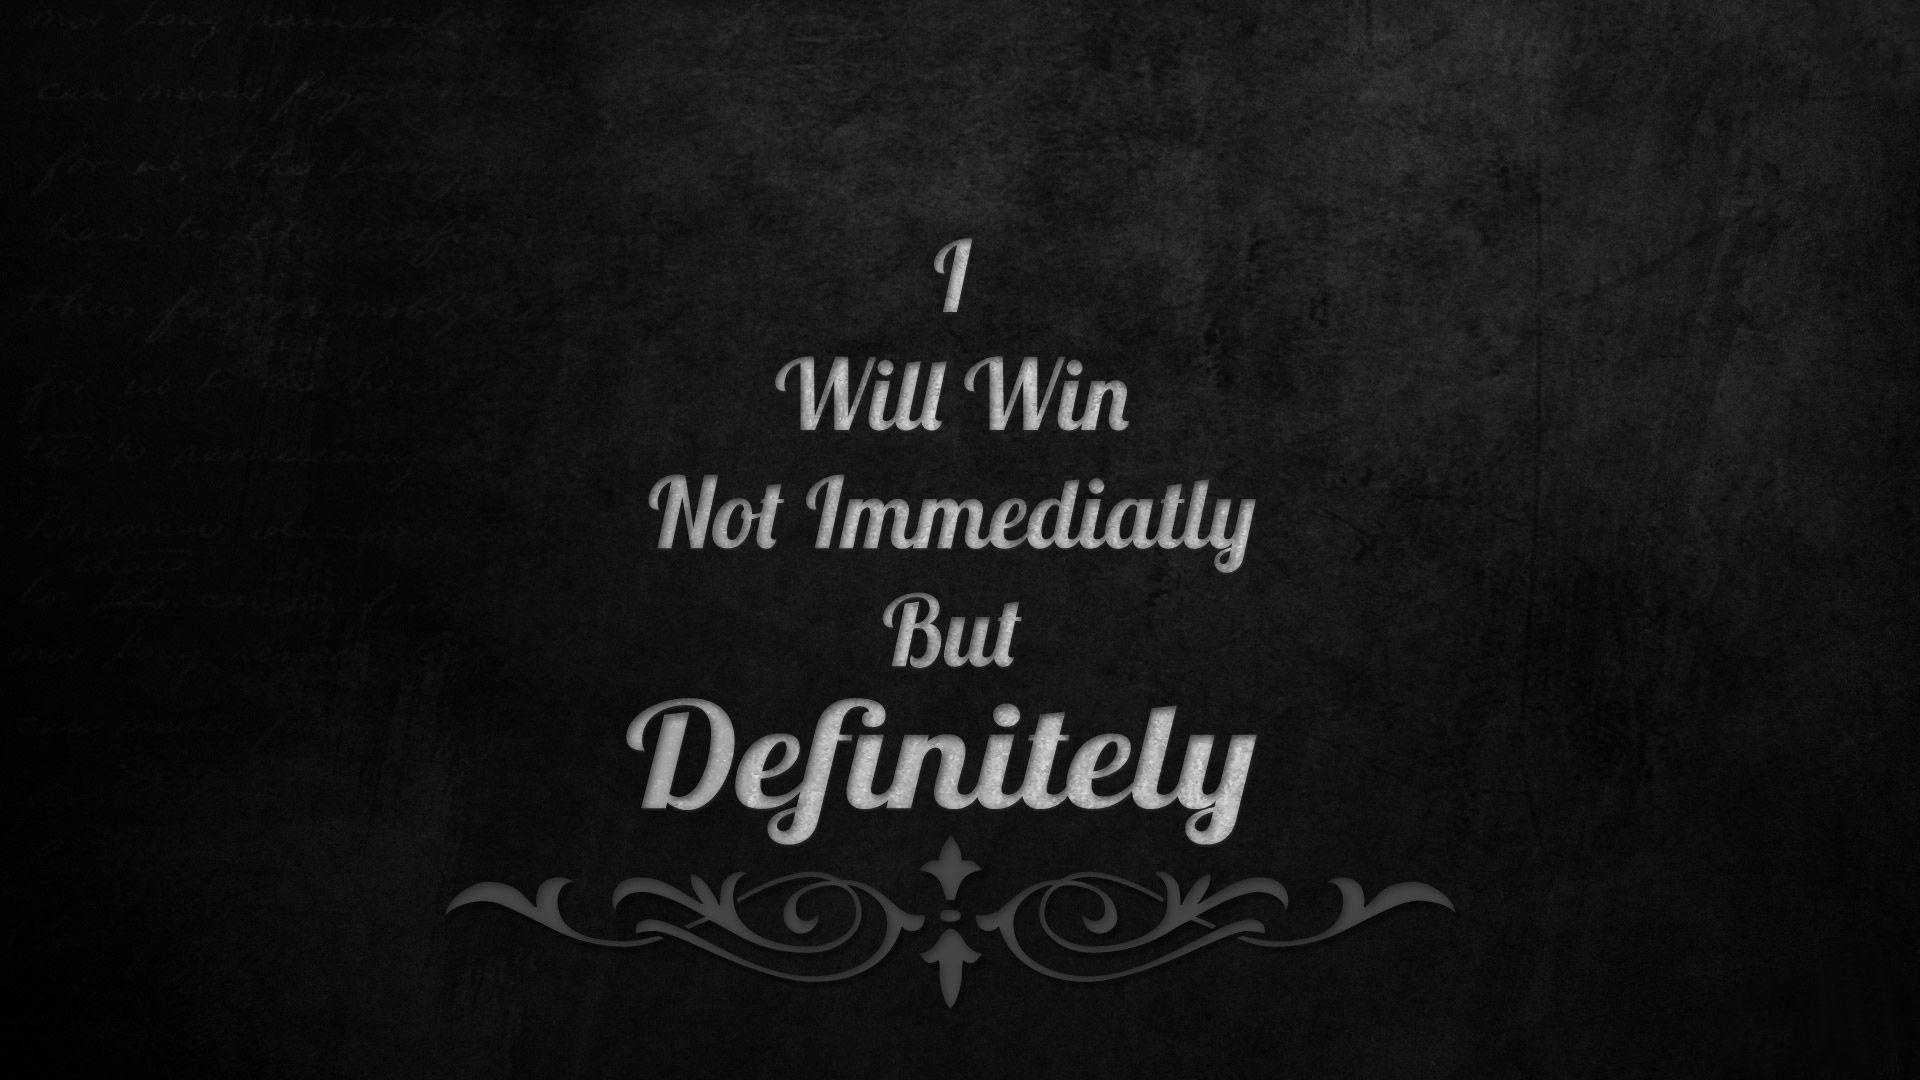 Inspirational Quotes Wallpaper Hd Free Download - HD Wallpaper